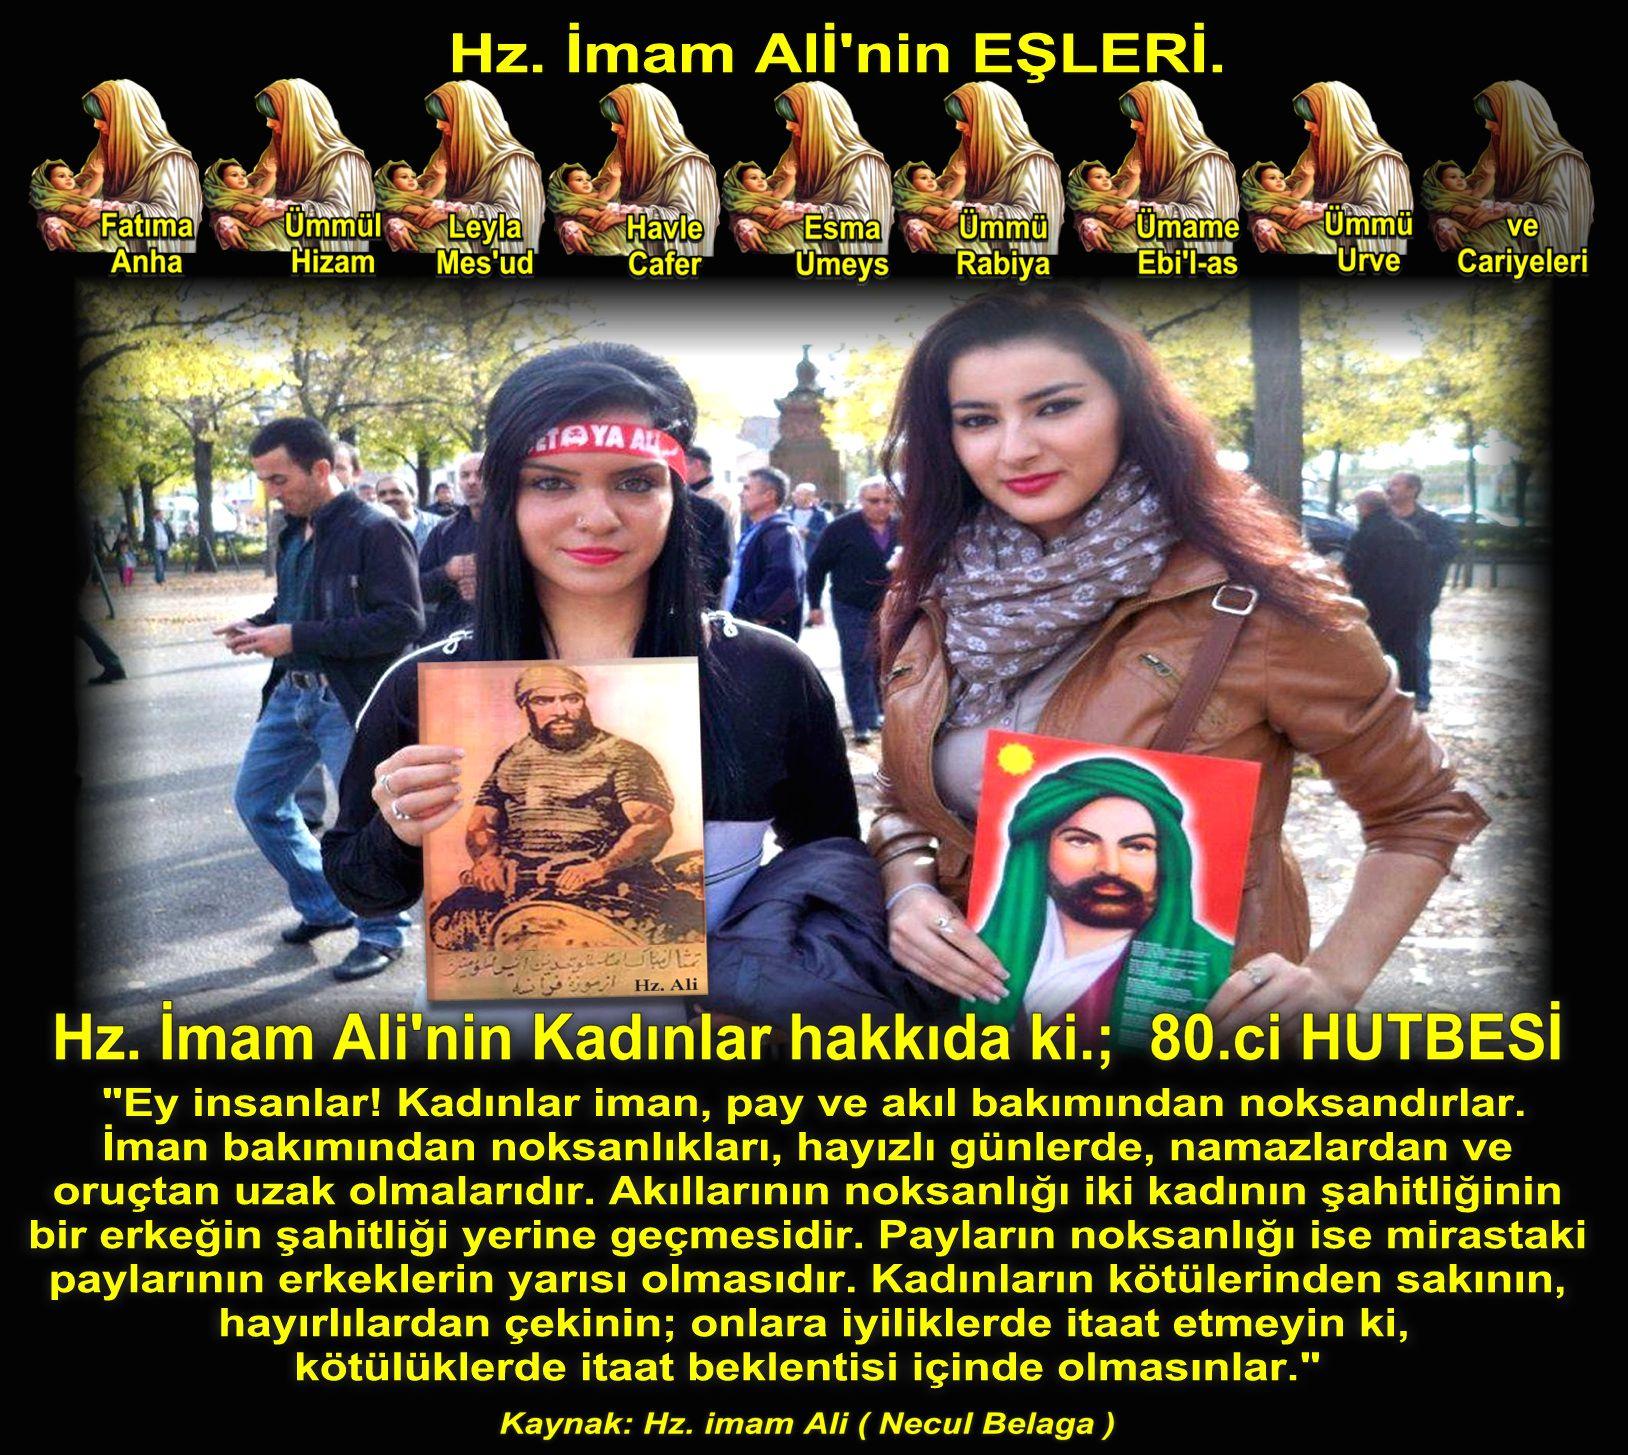 12 Hz imam Ali divani Alevi bektasi kizilbas pir sultan cemevi cem semah devrimci aleviler birligi DAB Feramuz Sah Acar imam ali arap alevi genclik kizlar siyah